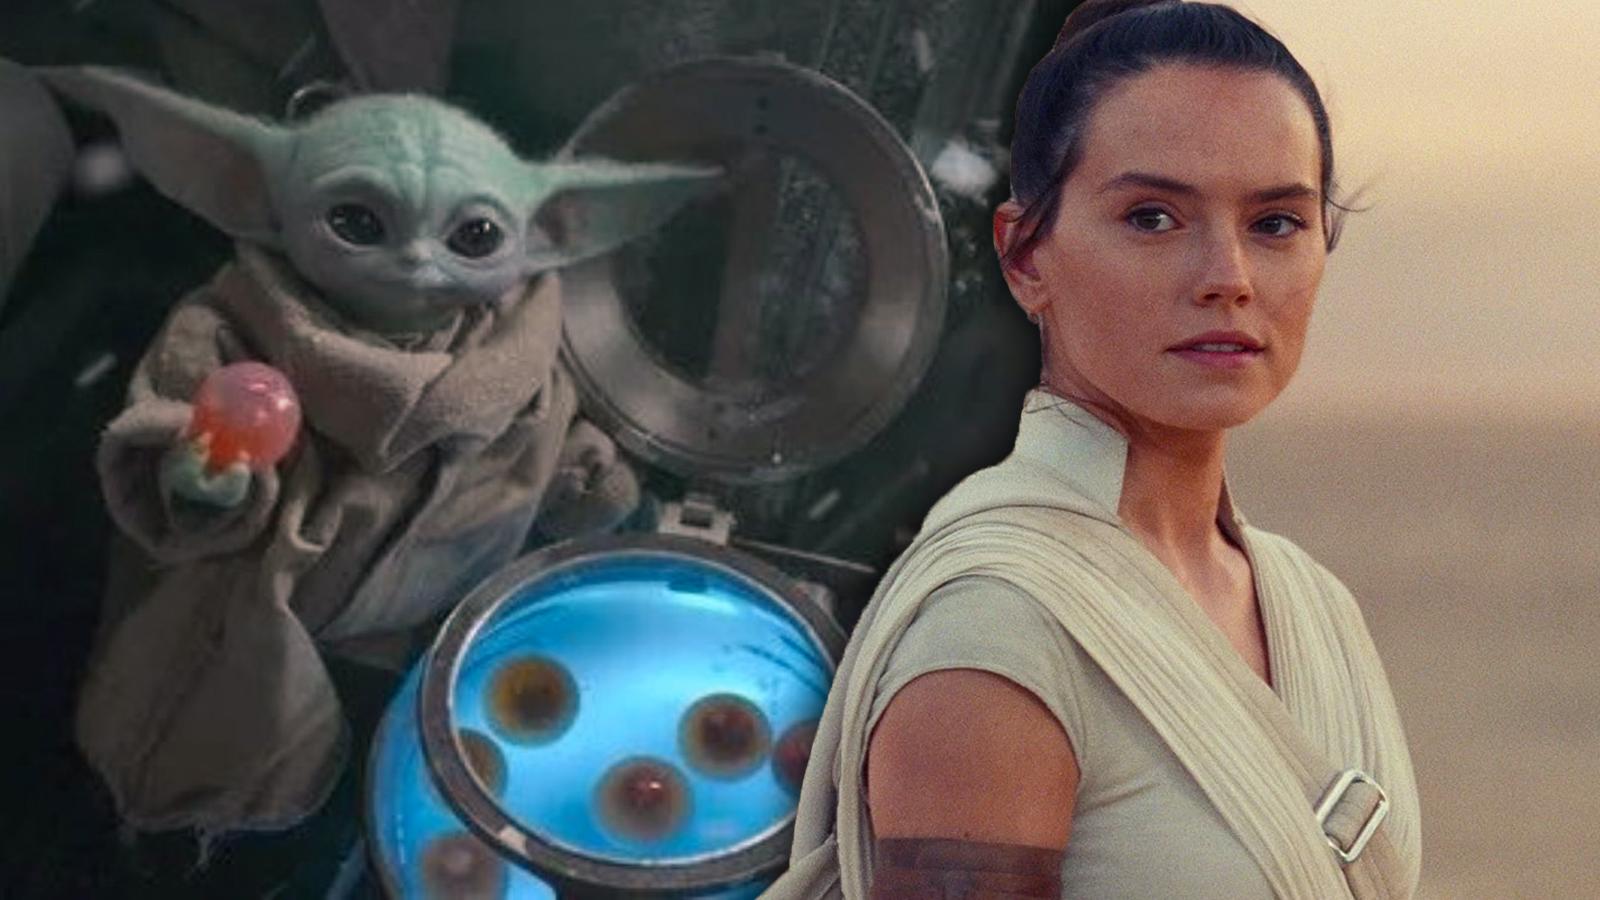 Daisy Ridley and Baby Yoda